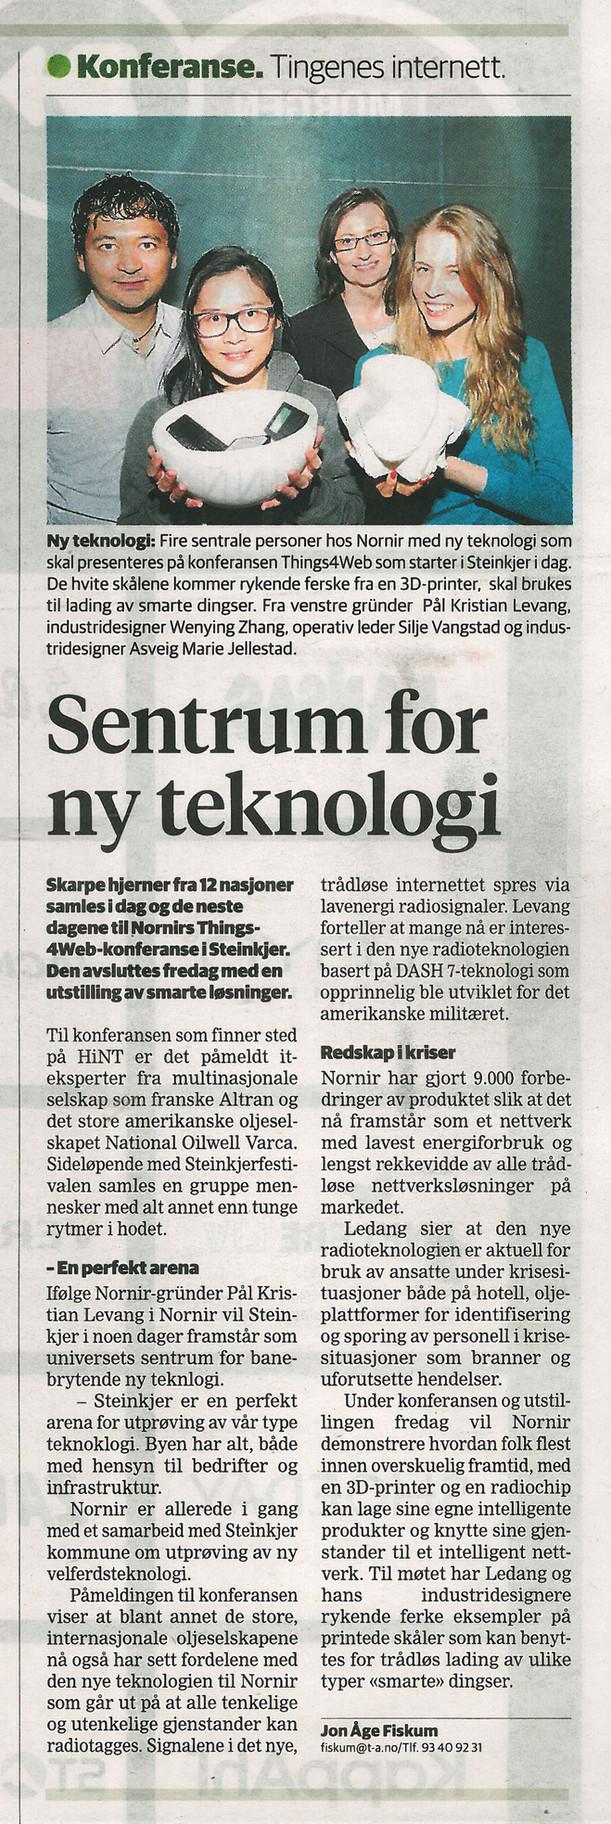 Trønder-Avisa | Sentrum for ny teknologi